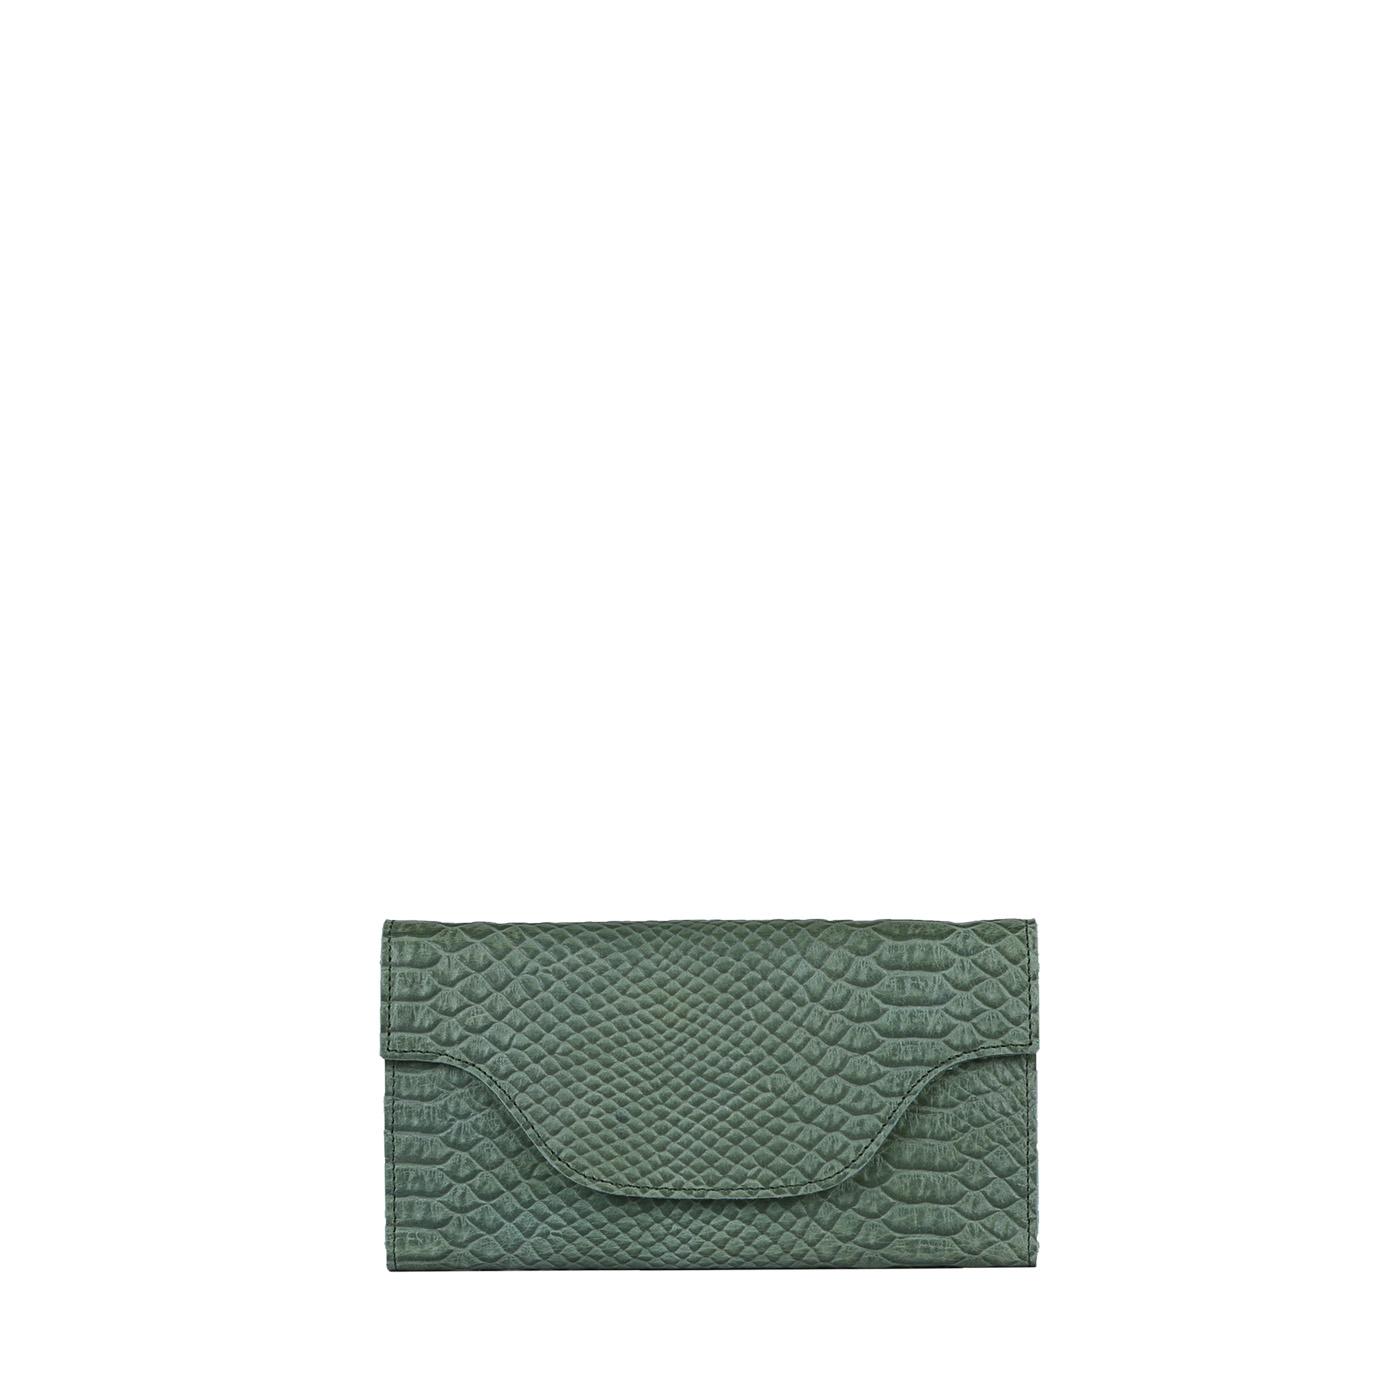 MY CARRY BAG Wallet Large (RFID) - anaconda sea green